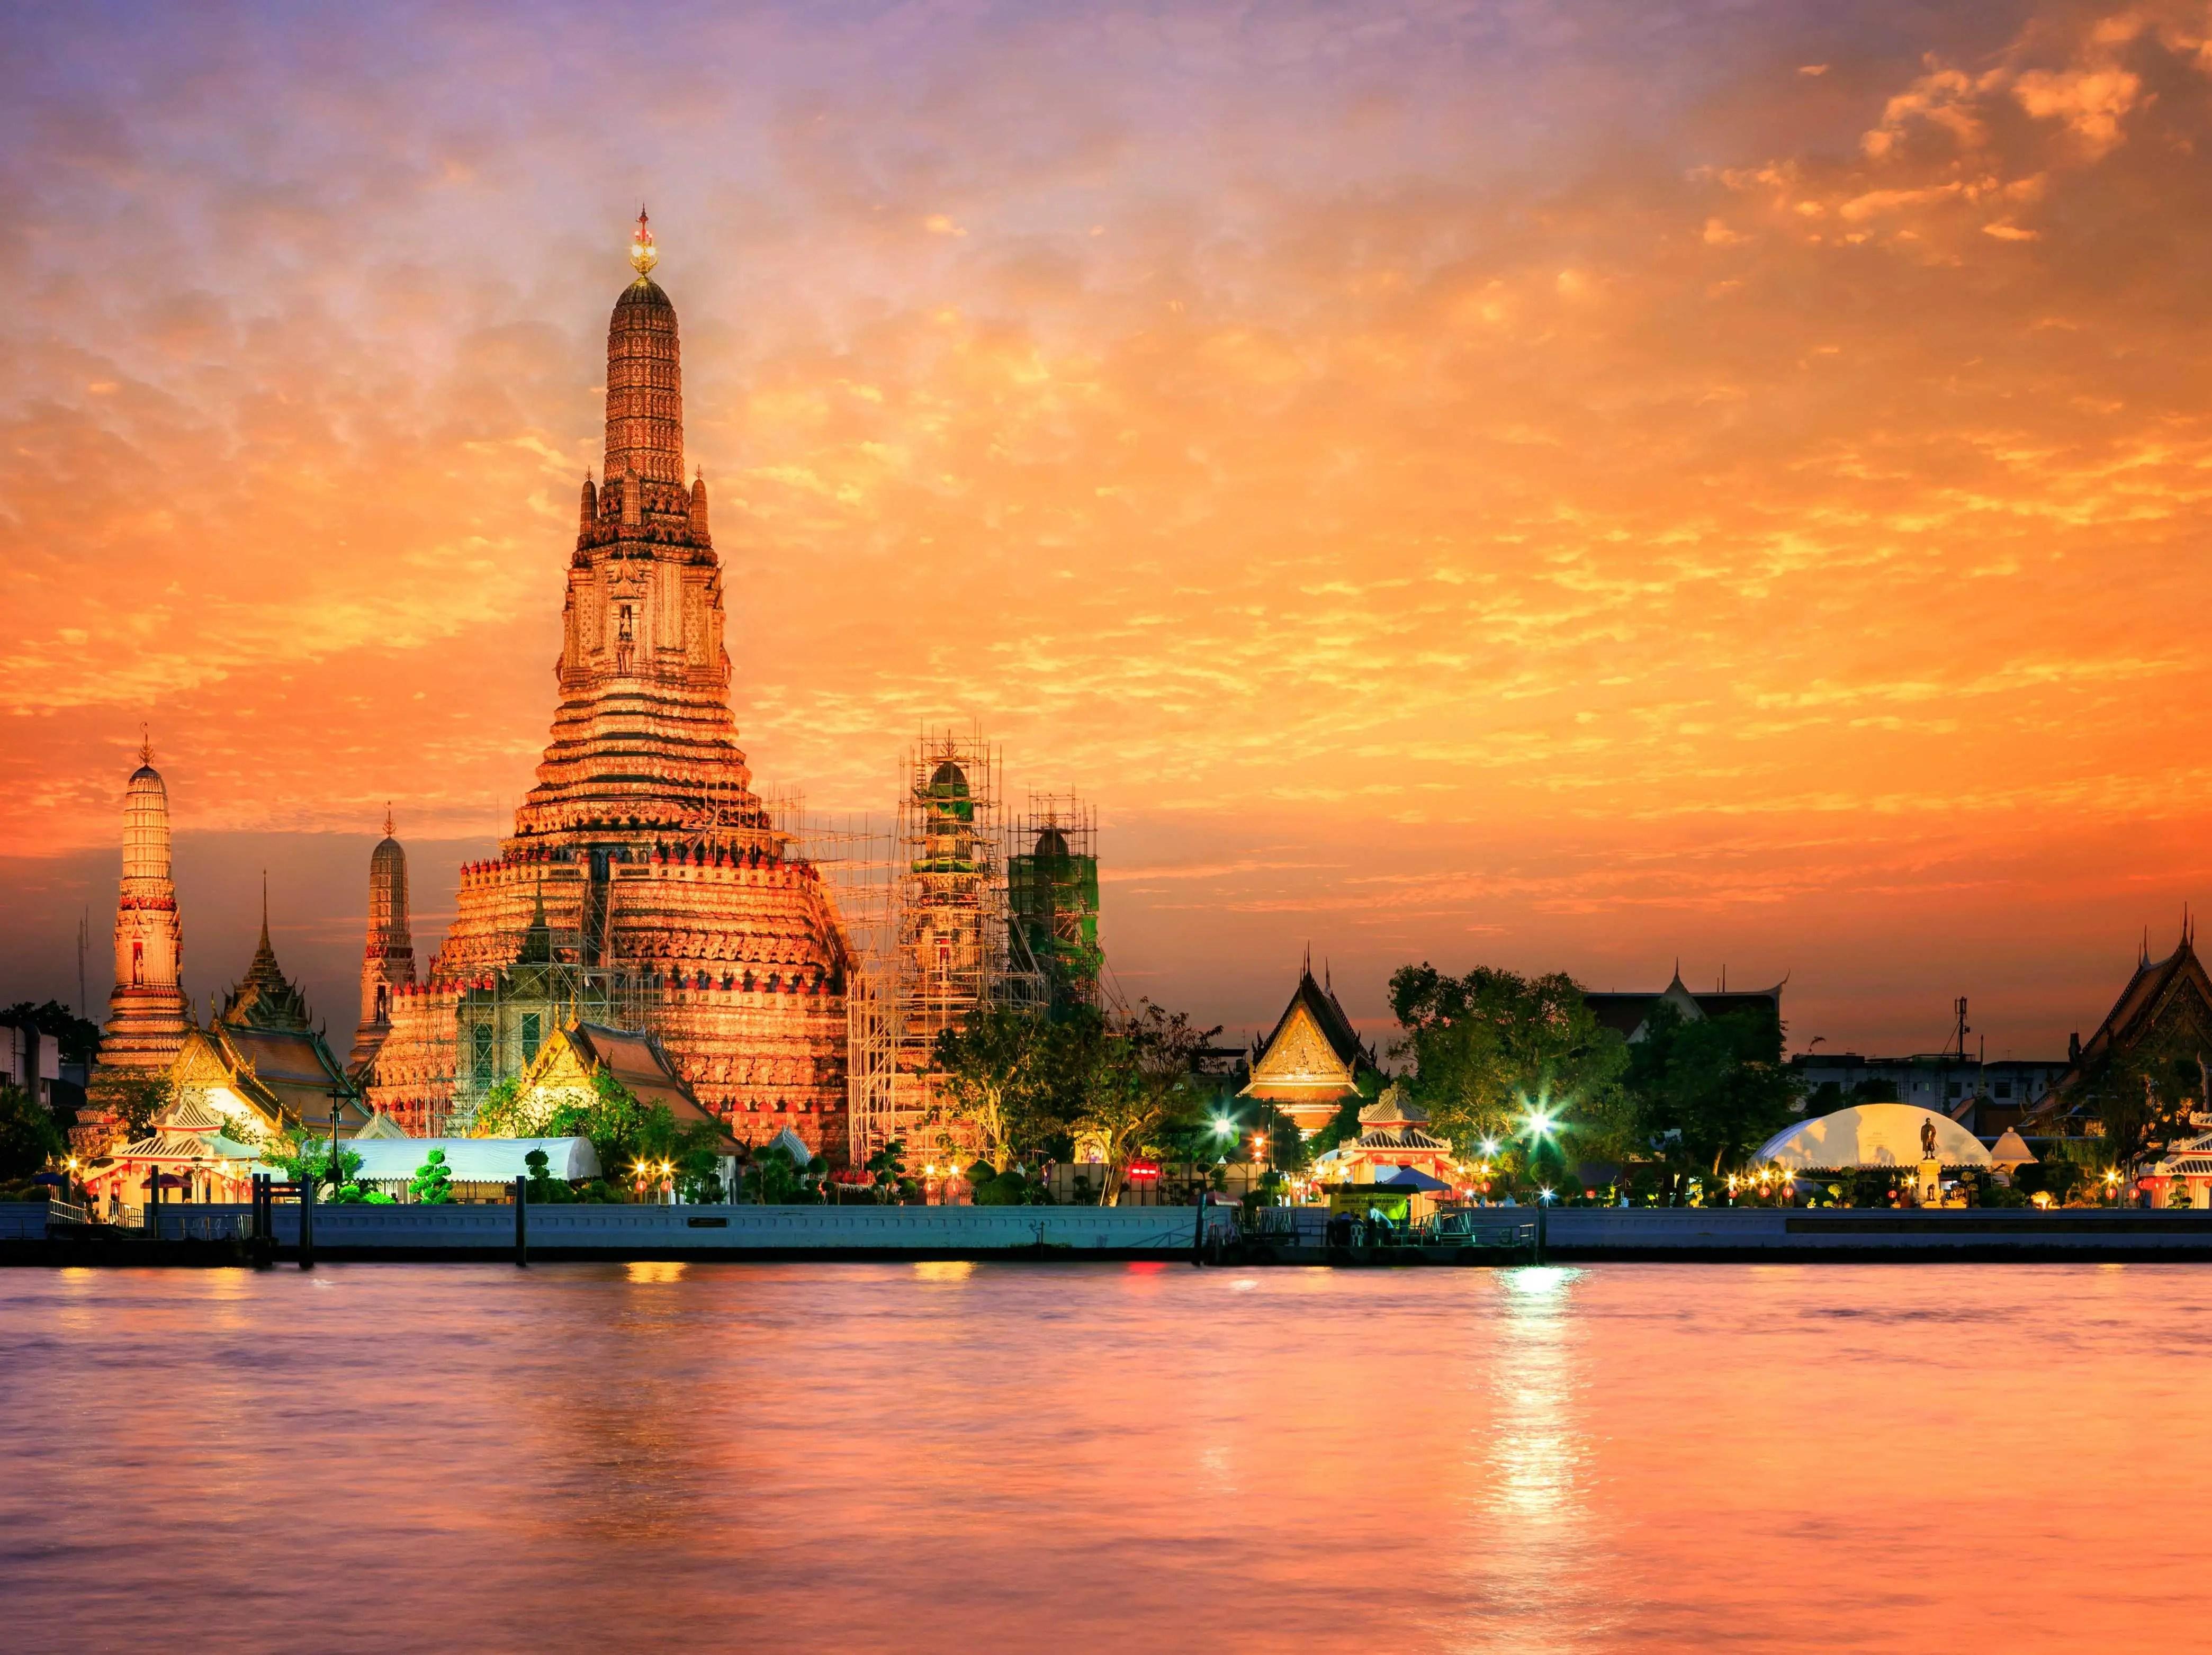 6. Bangkok